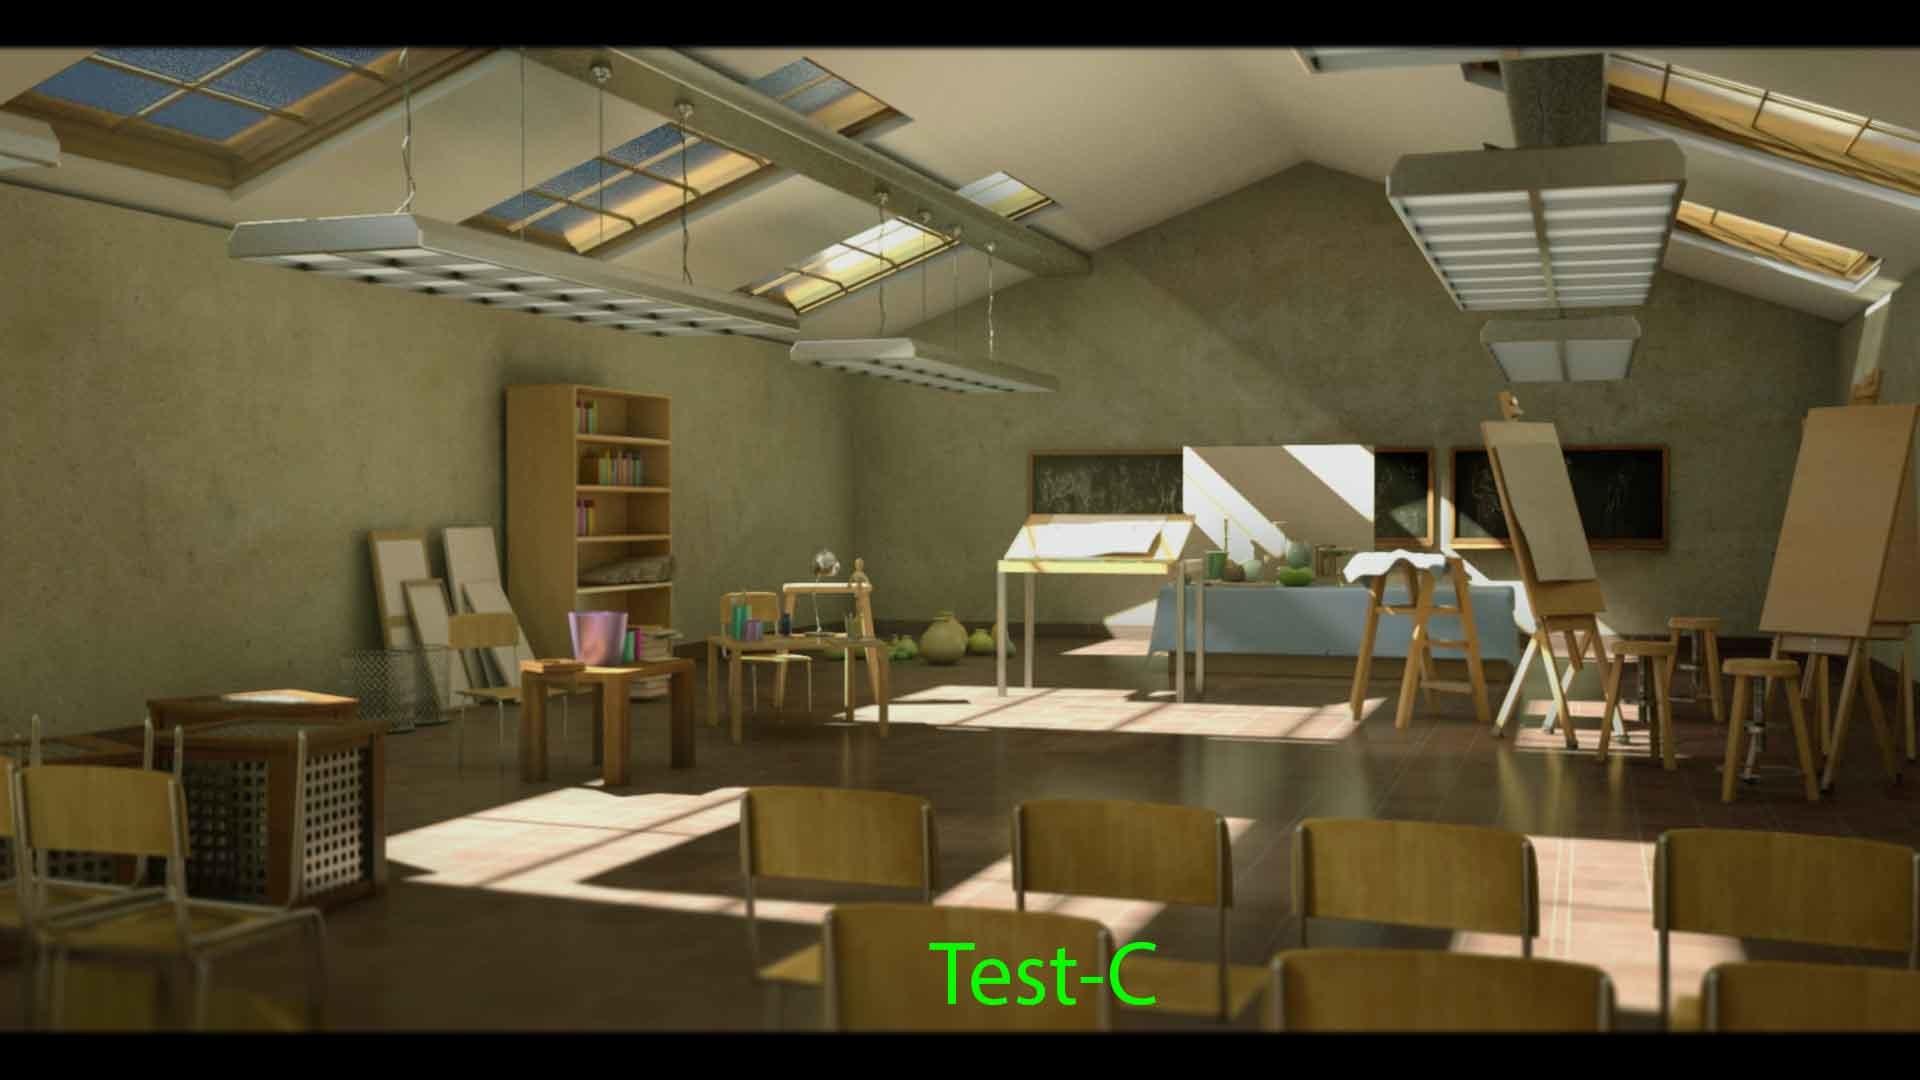 Parabhdeep singh test c